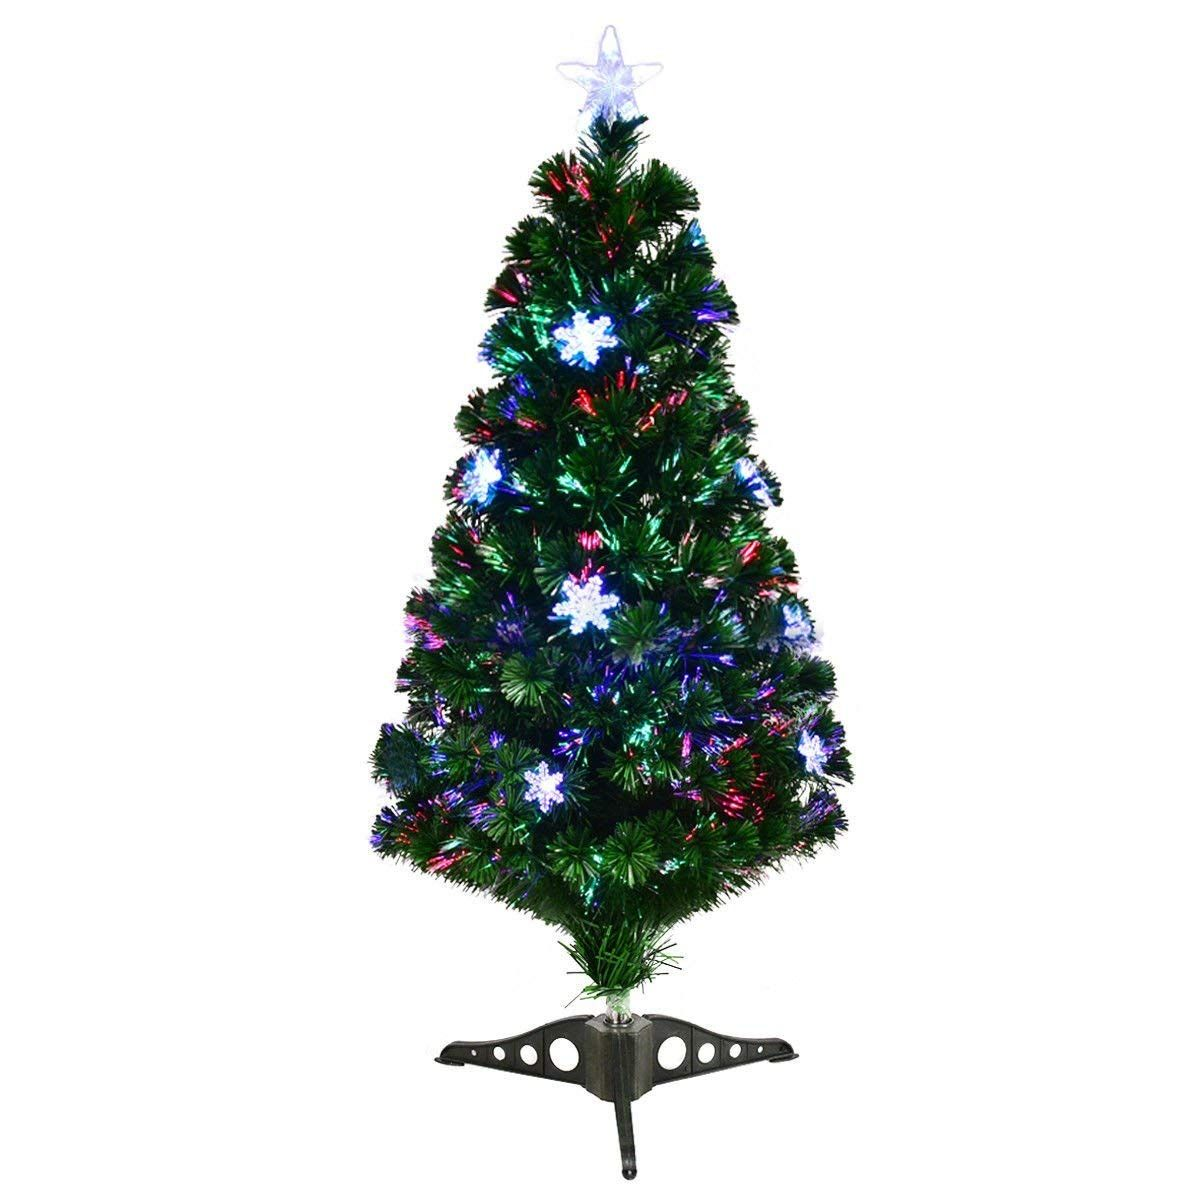 Goplus 3ft Prelit Fiber Optic Artificial Christmas Tree With Multicolor Led Lights And Snowfl Christmas Tree Fiber Optic Christmas Tree Colorful Christmas Tree